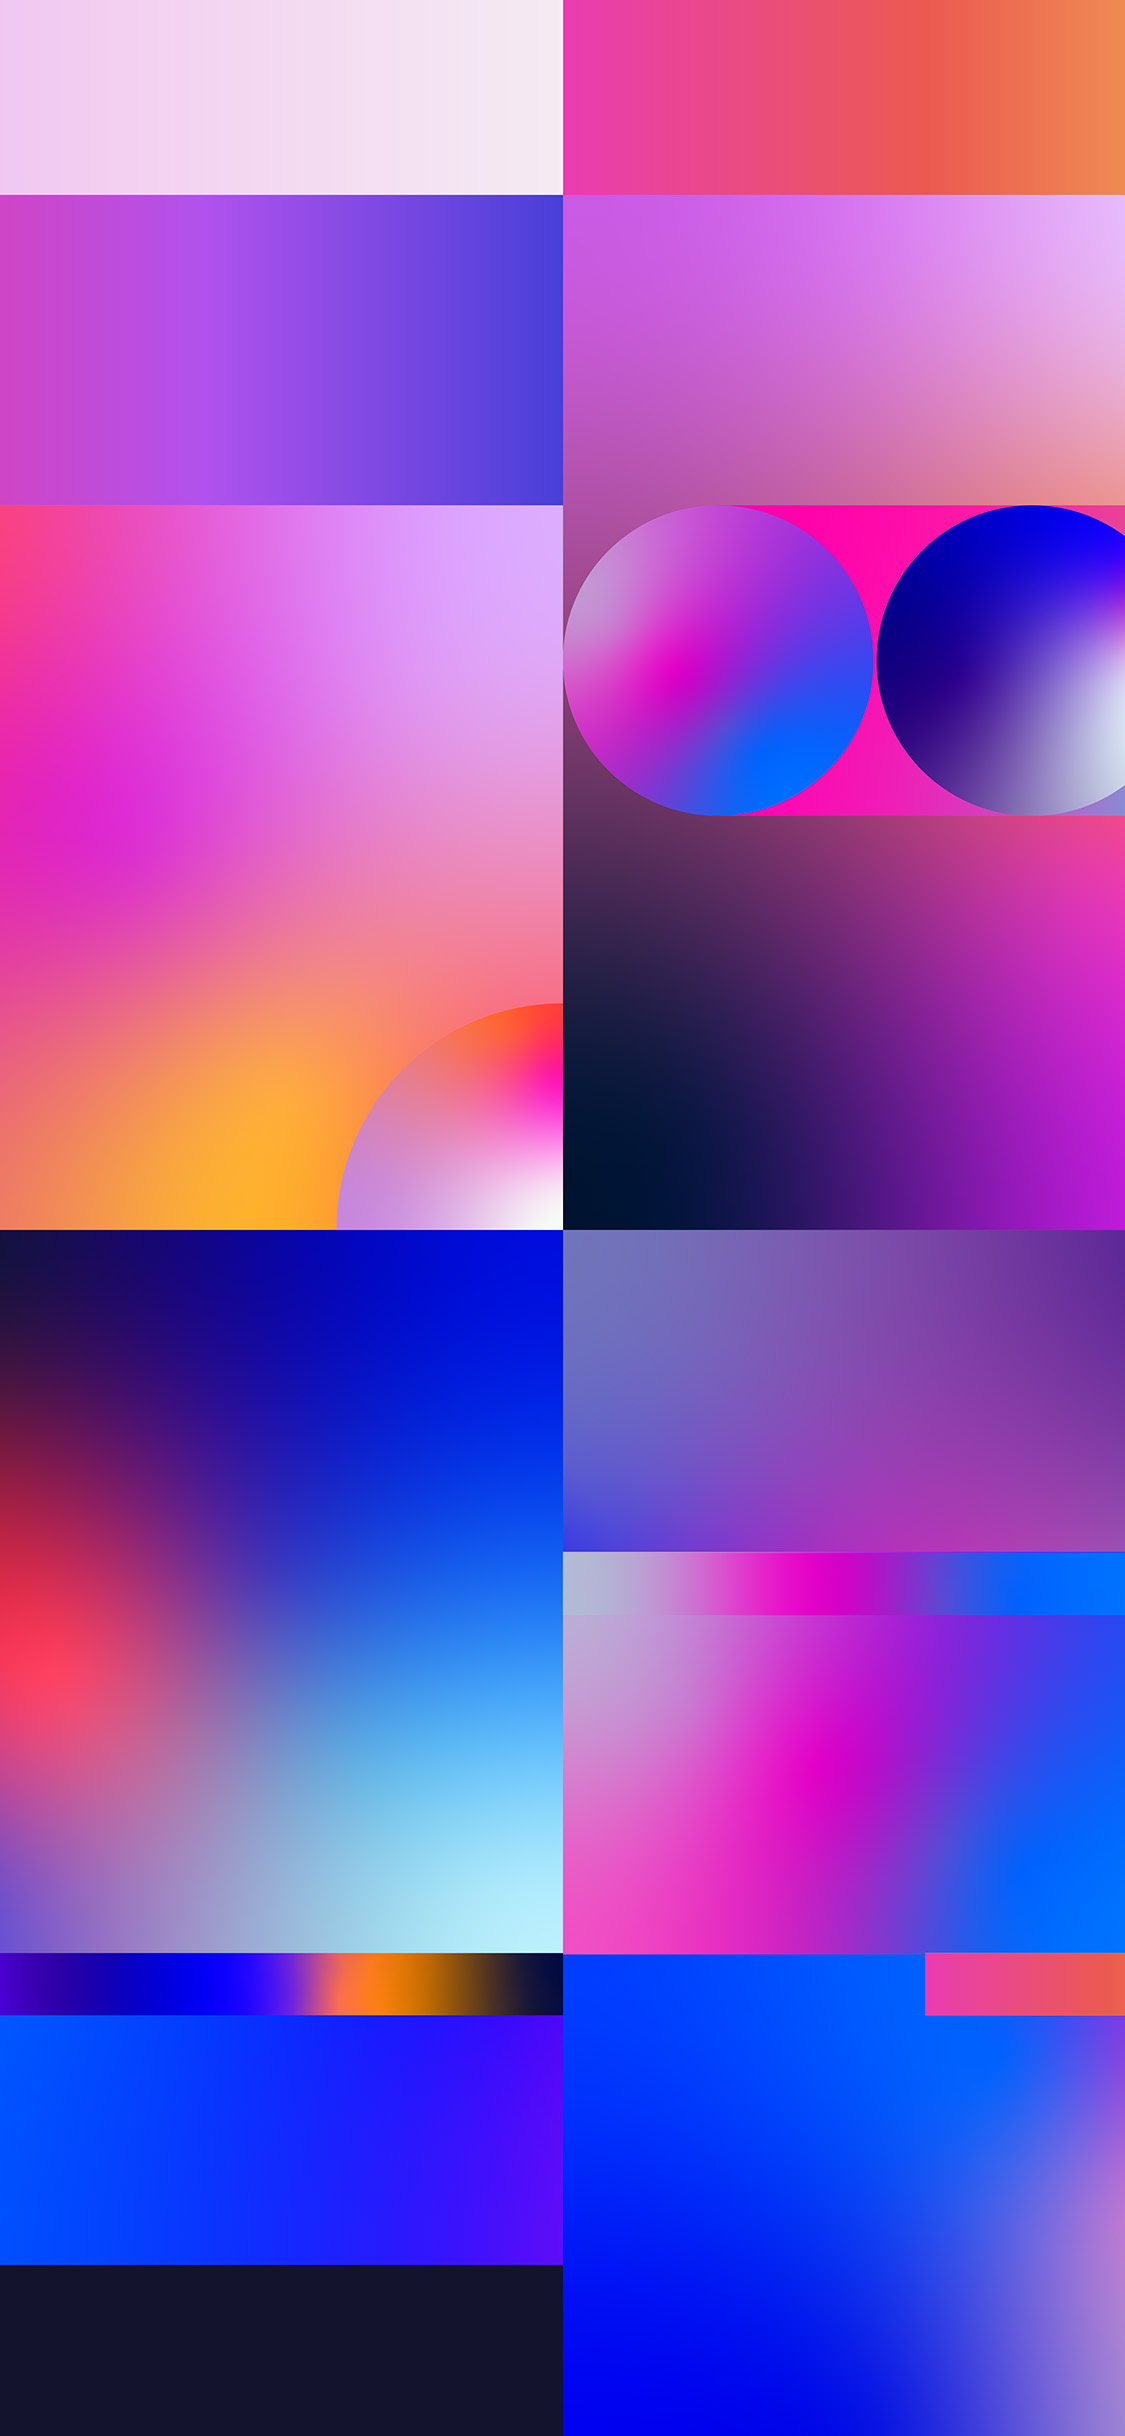 Wallpaper-028